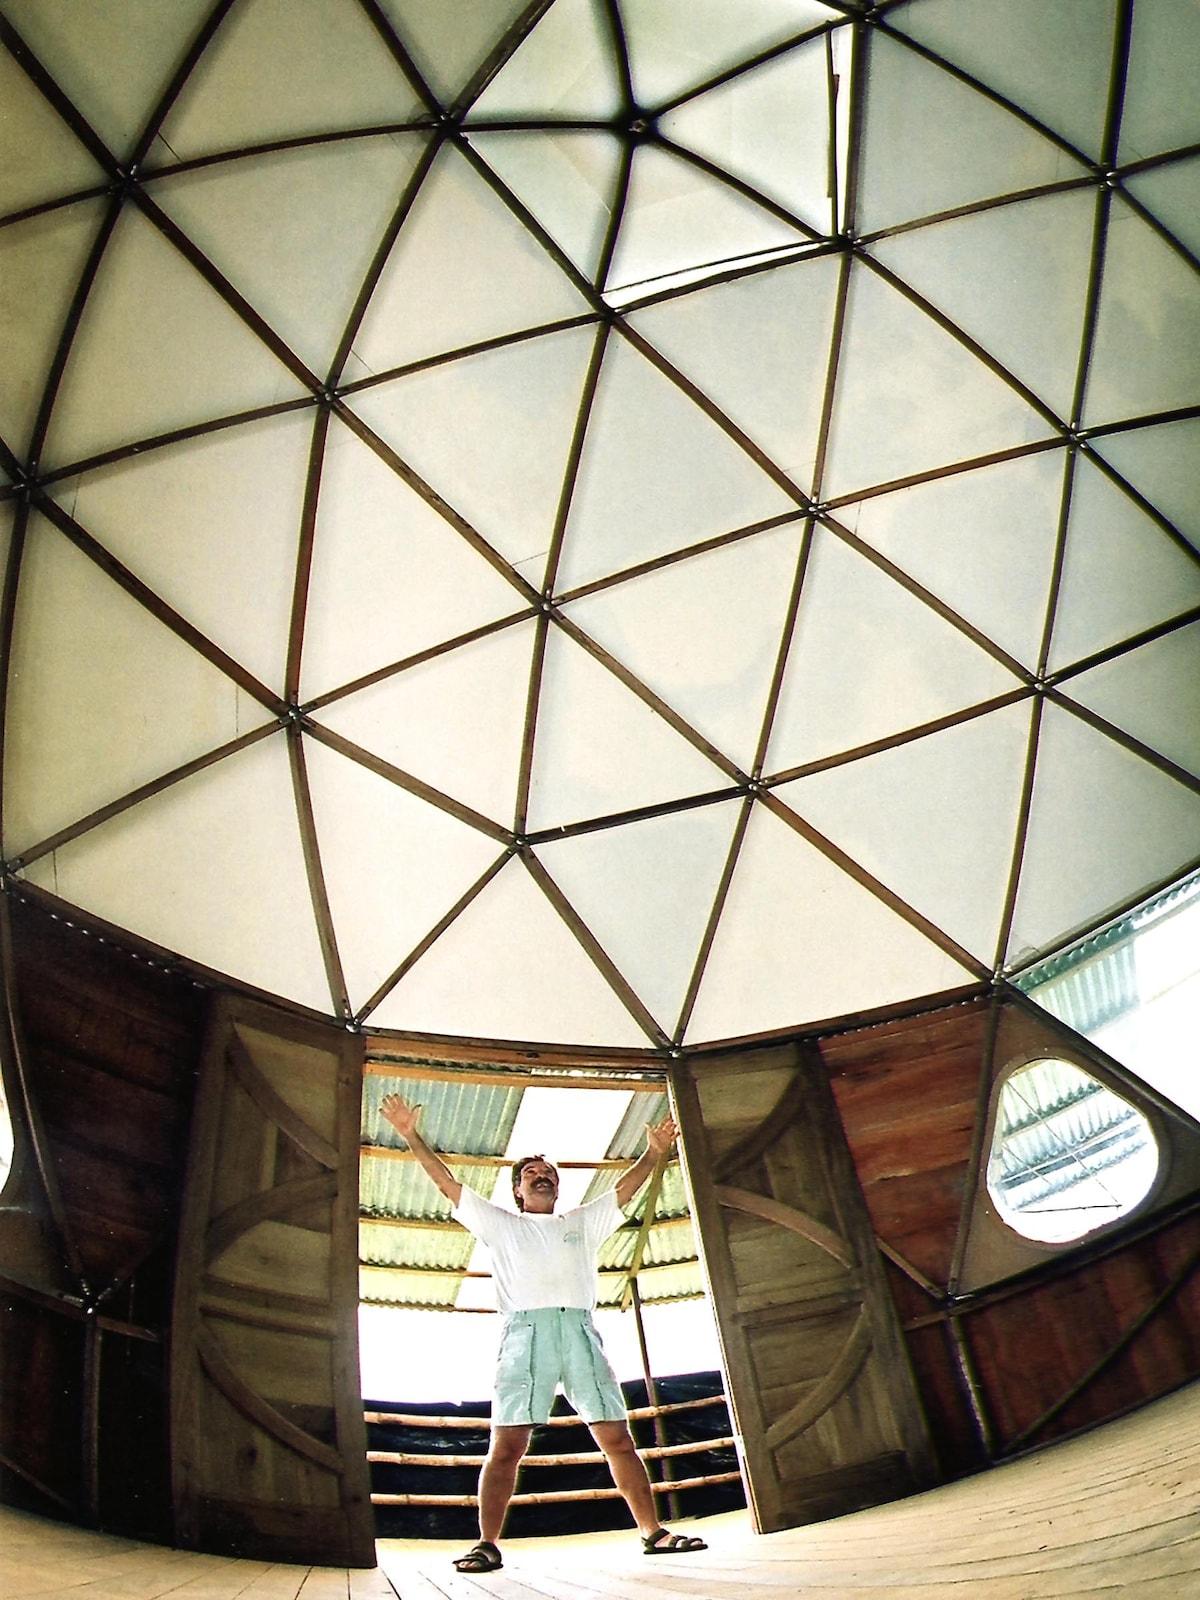 Geodesic dome for holistic exercises, we practice Do-In - Domo geodesico para ejercicios holisticos, nosotros practicamos Do-In